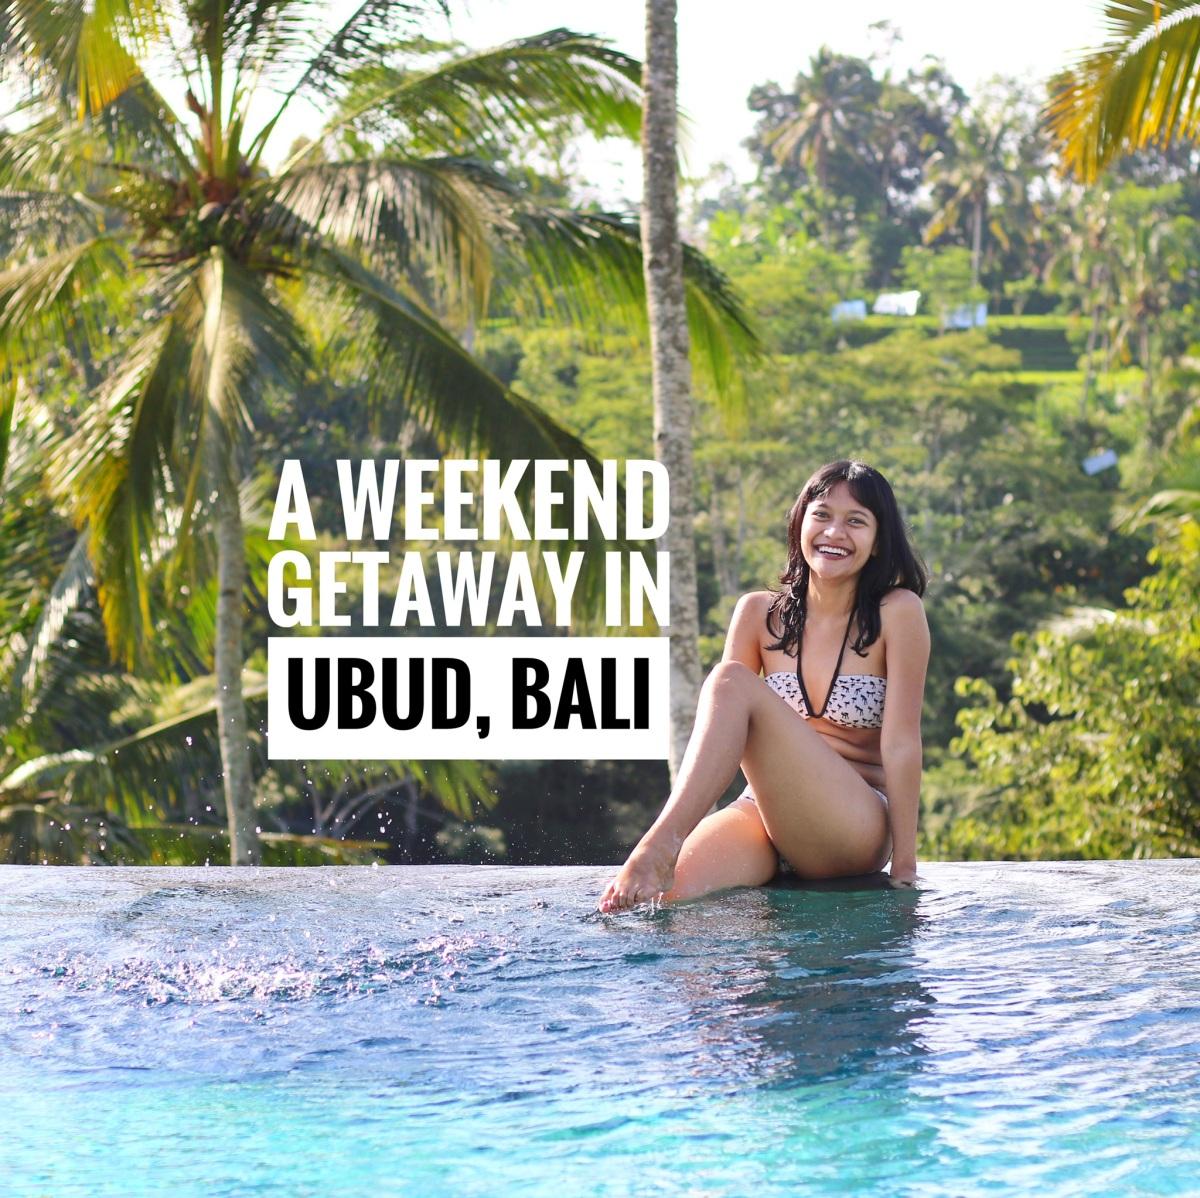 A Weekend Getaway in Ubud, Bali